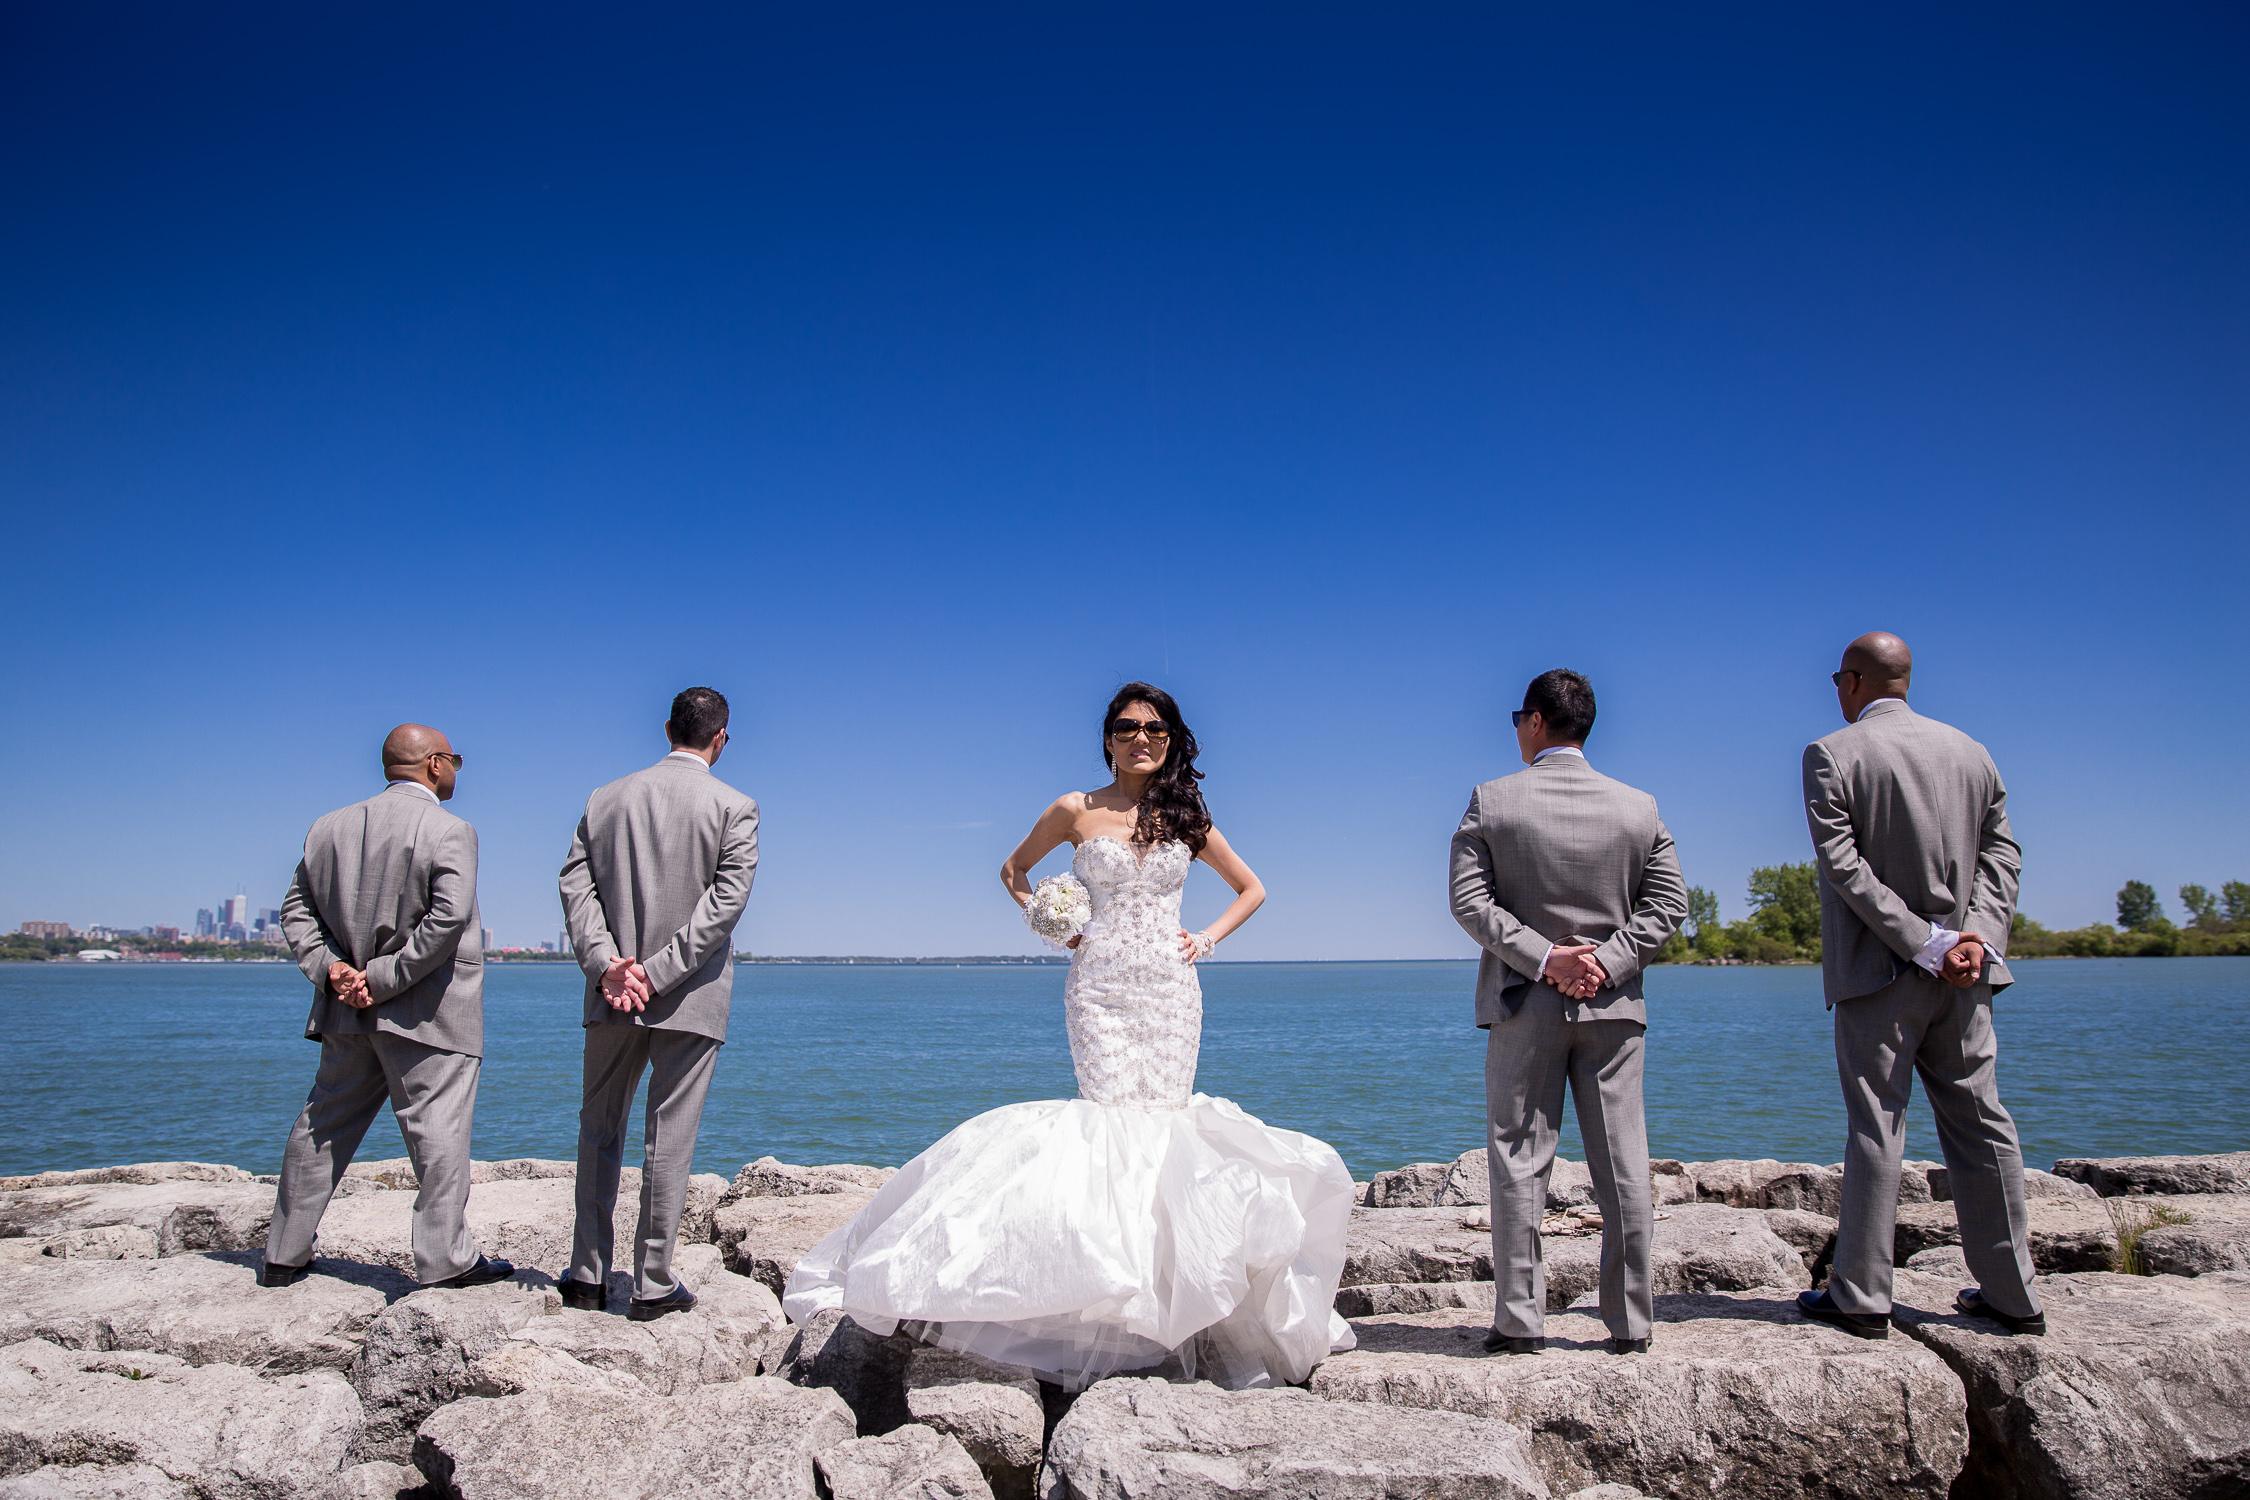 Paradise-Banquet-Hall-Wedding-Vaughan-Ontario-0057.jpg